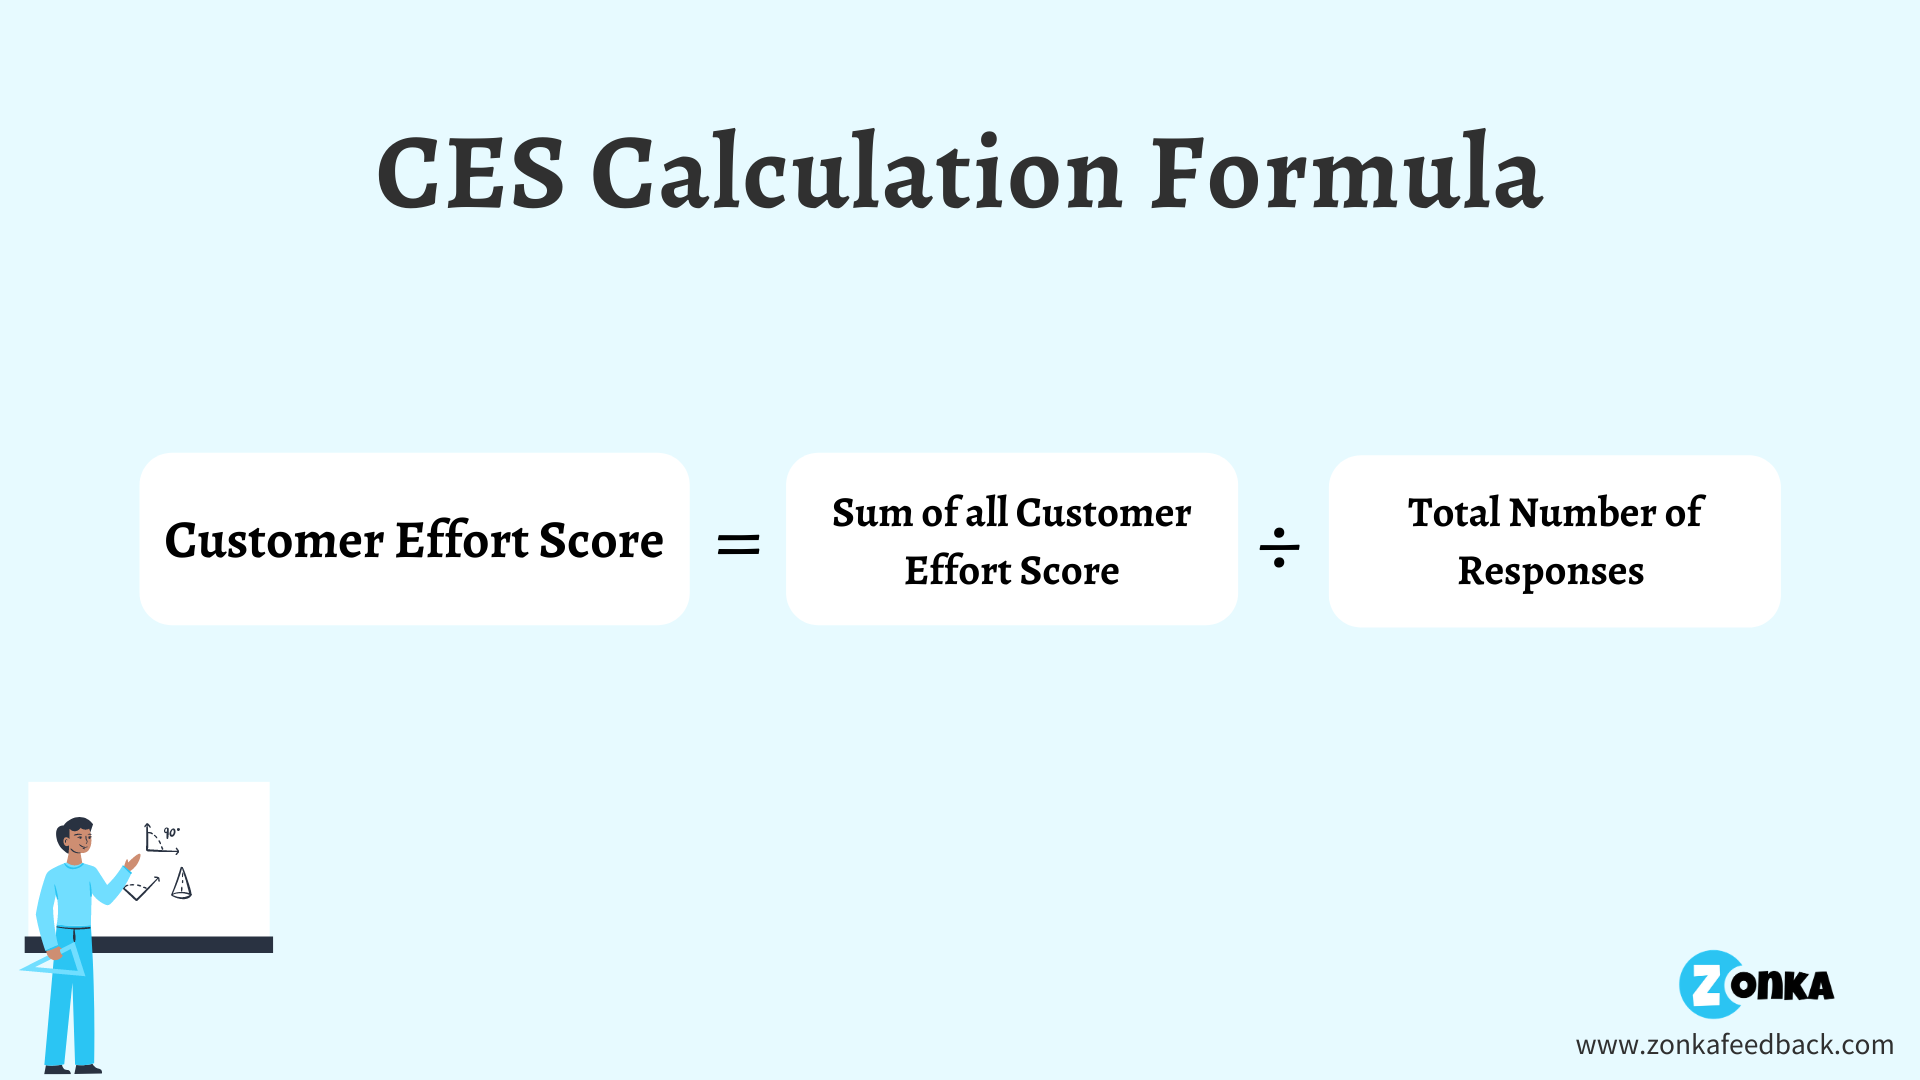 CES Calculation Formula